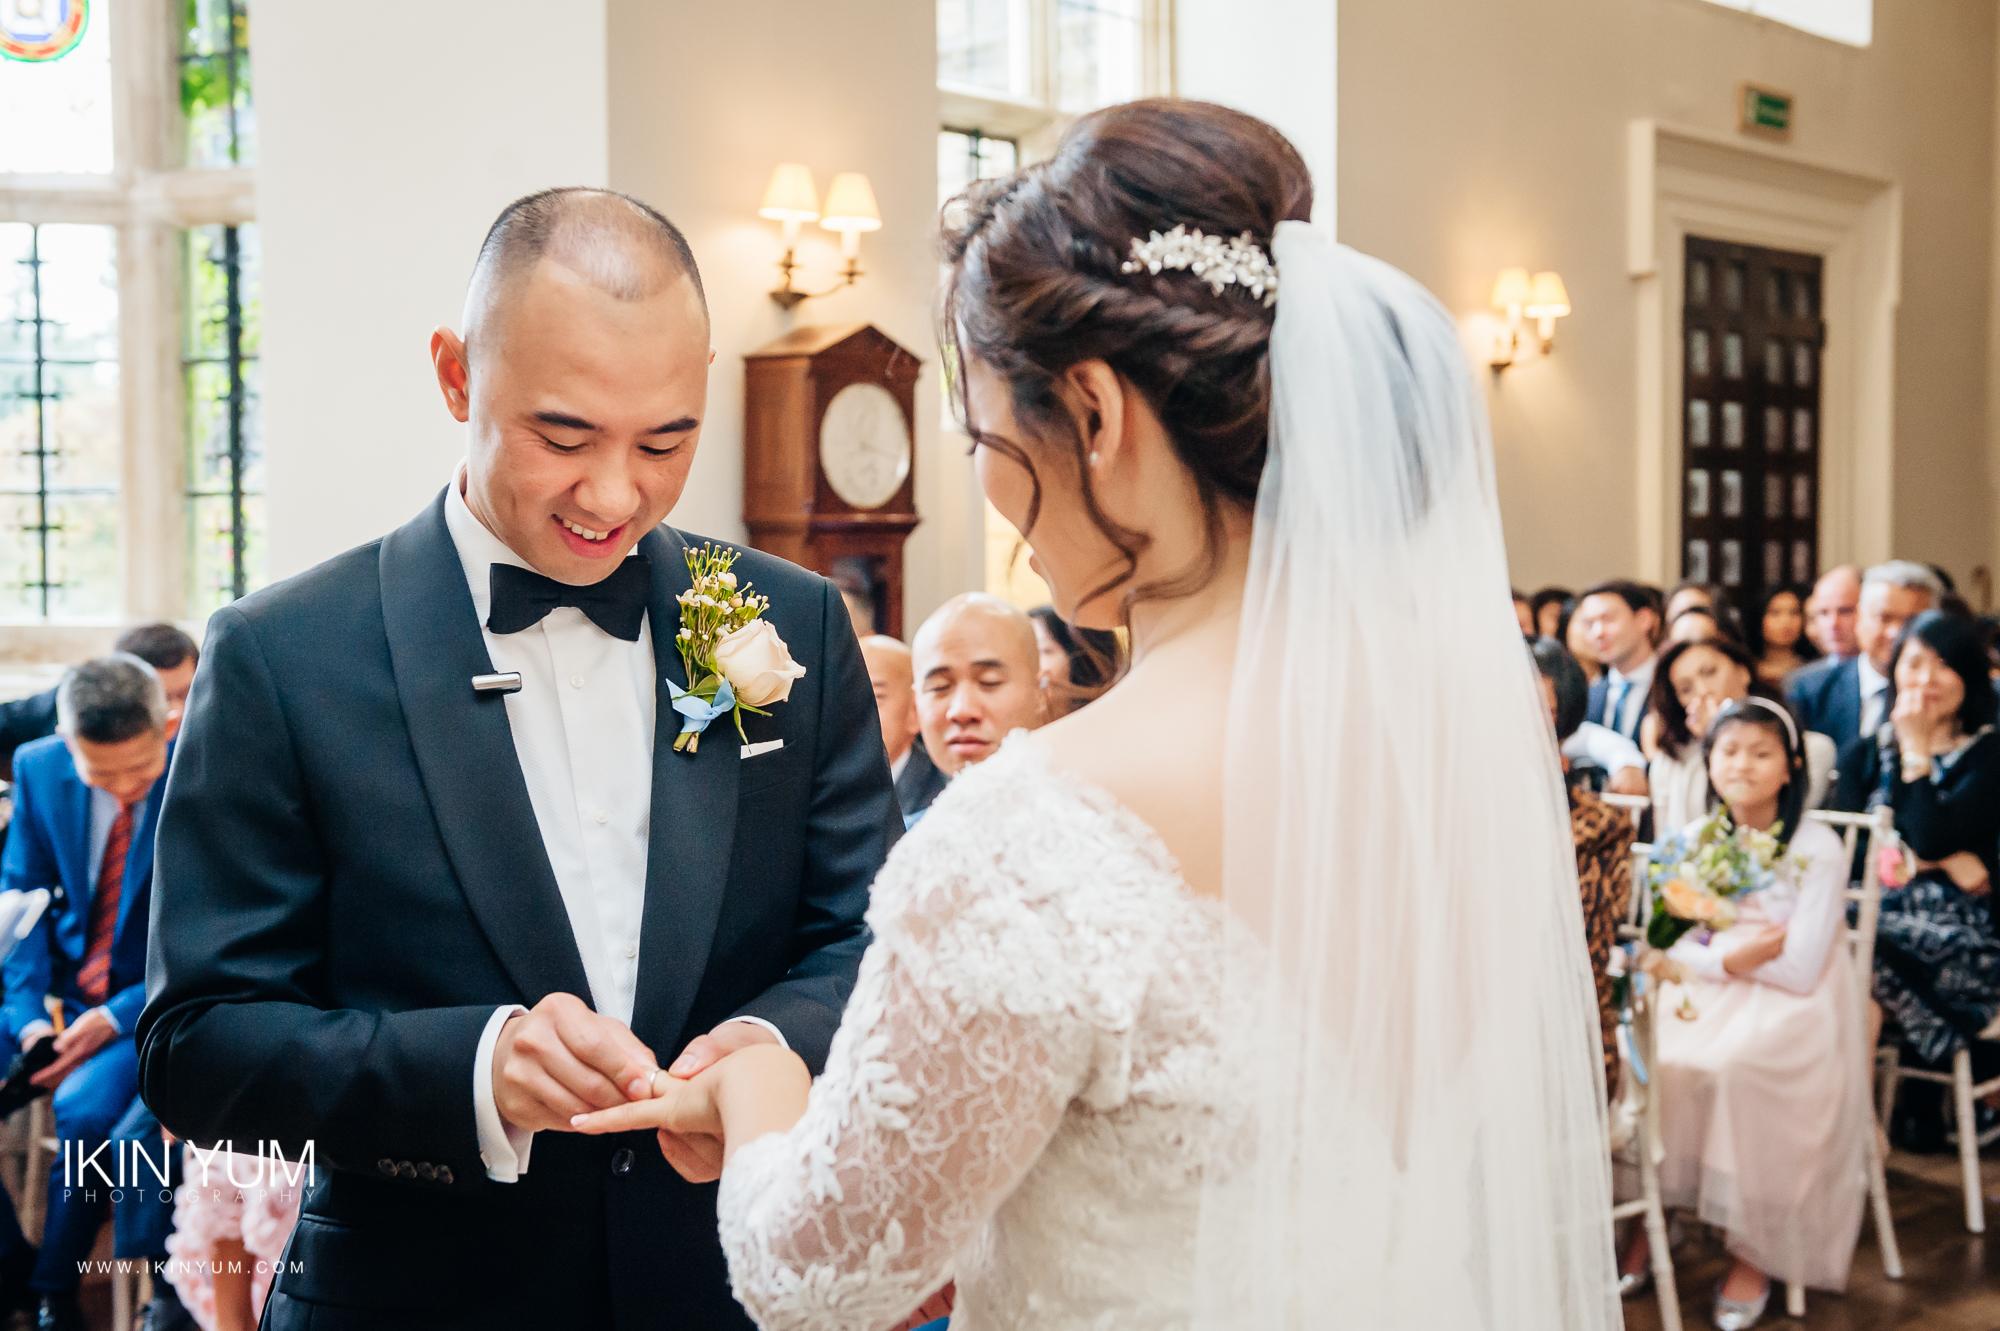 Elmore Court Wedding- Ikin Yum Photography-0057.jpg